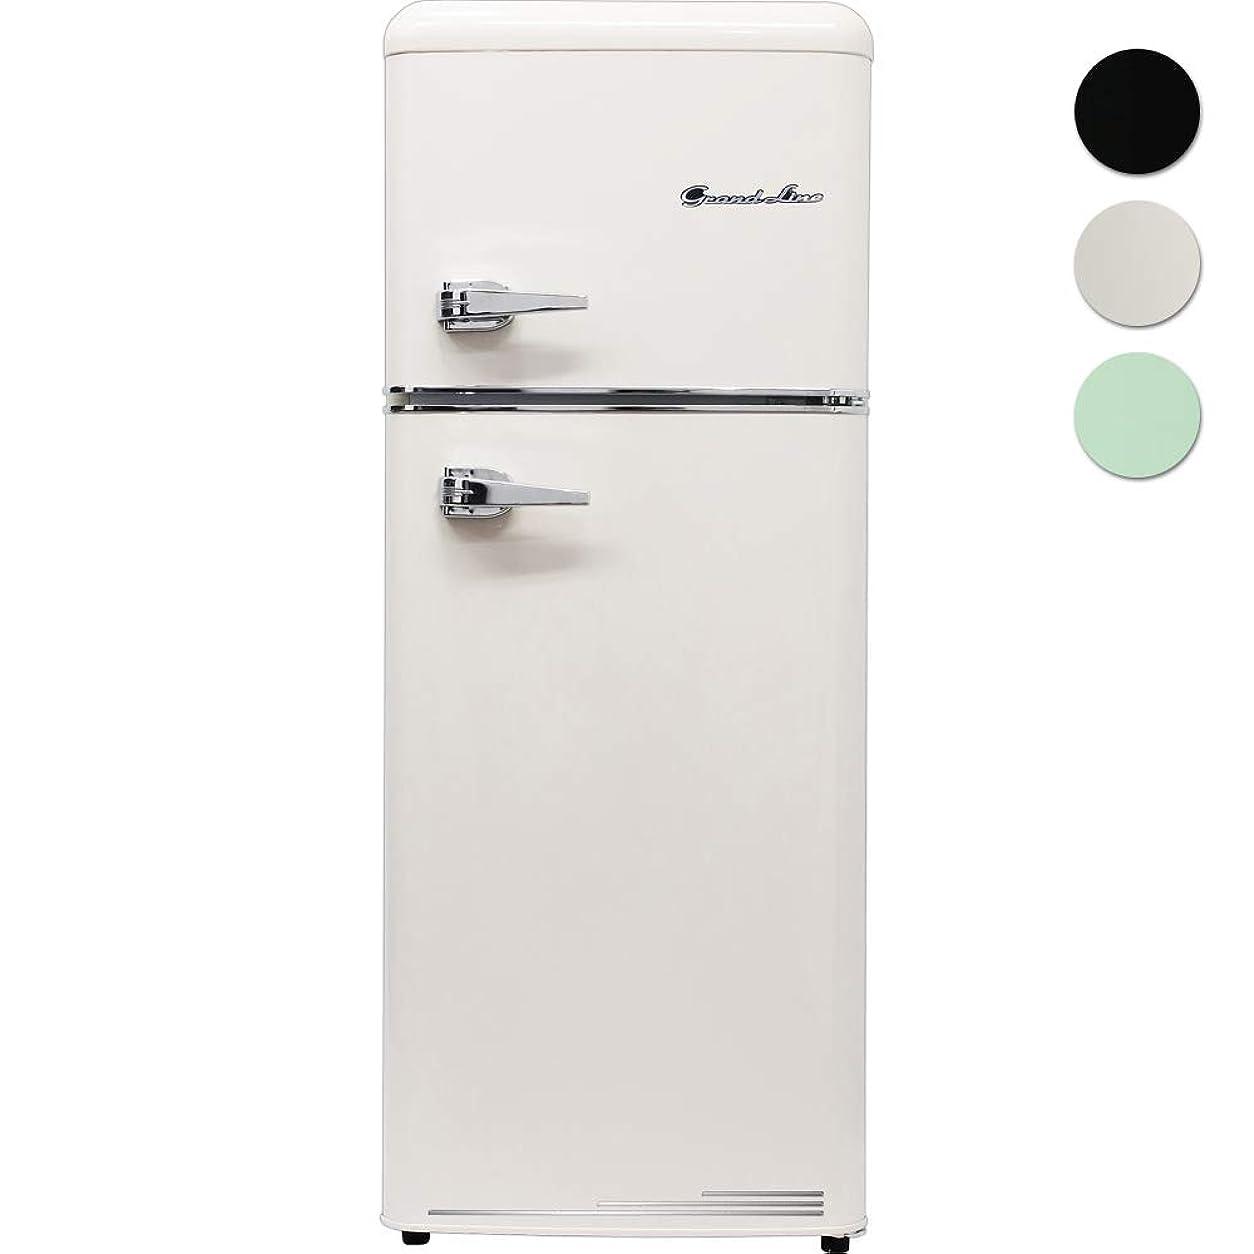 Grand-Line 2ドア レトロ冷凍/冷蔵庫 115L レトロホワイト ARE-115LW